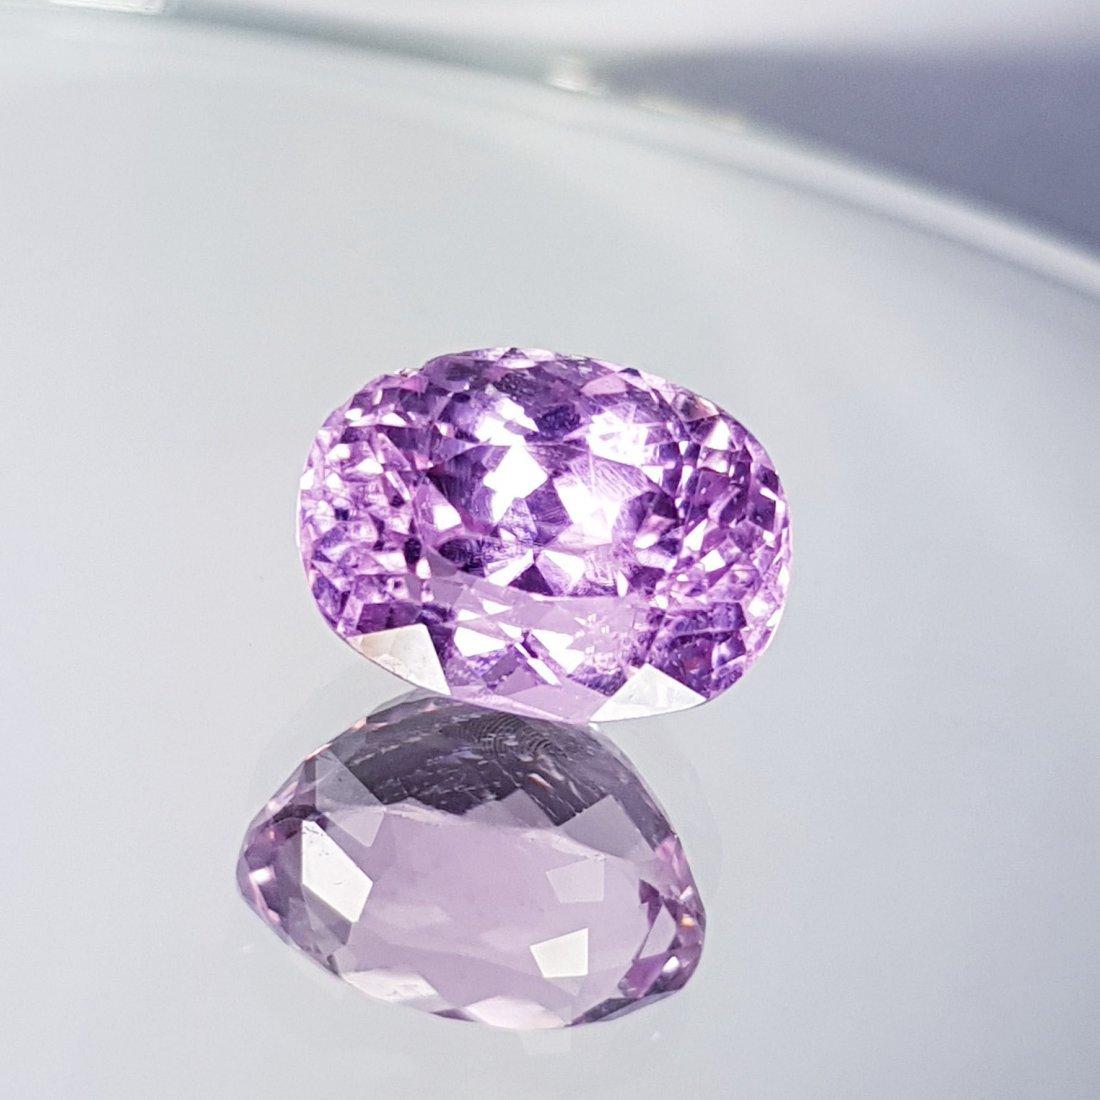 Pink Kunzite - 7.48 ct - 2